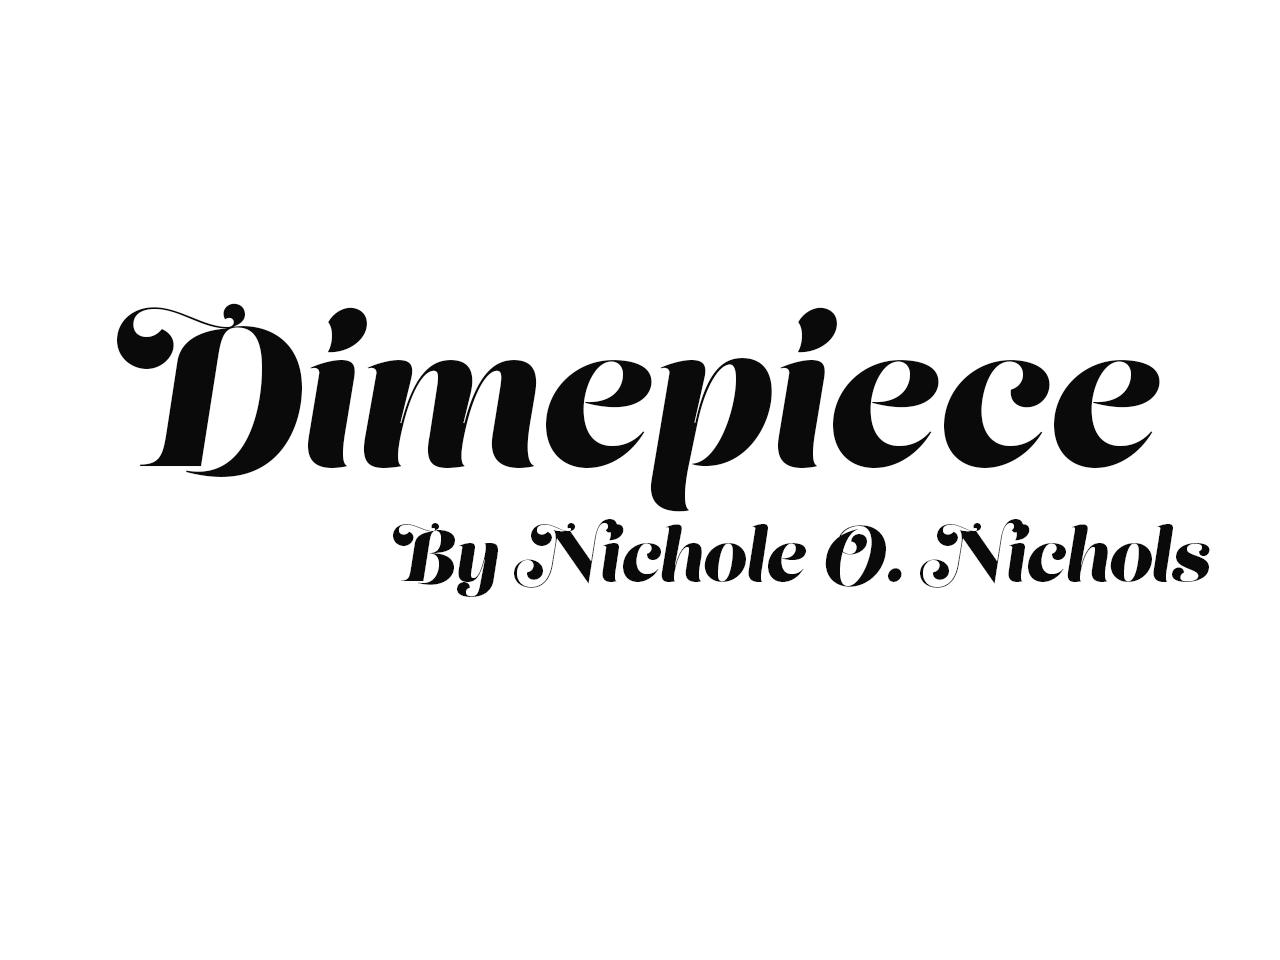 Dimepiece.png